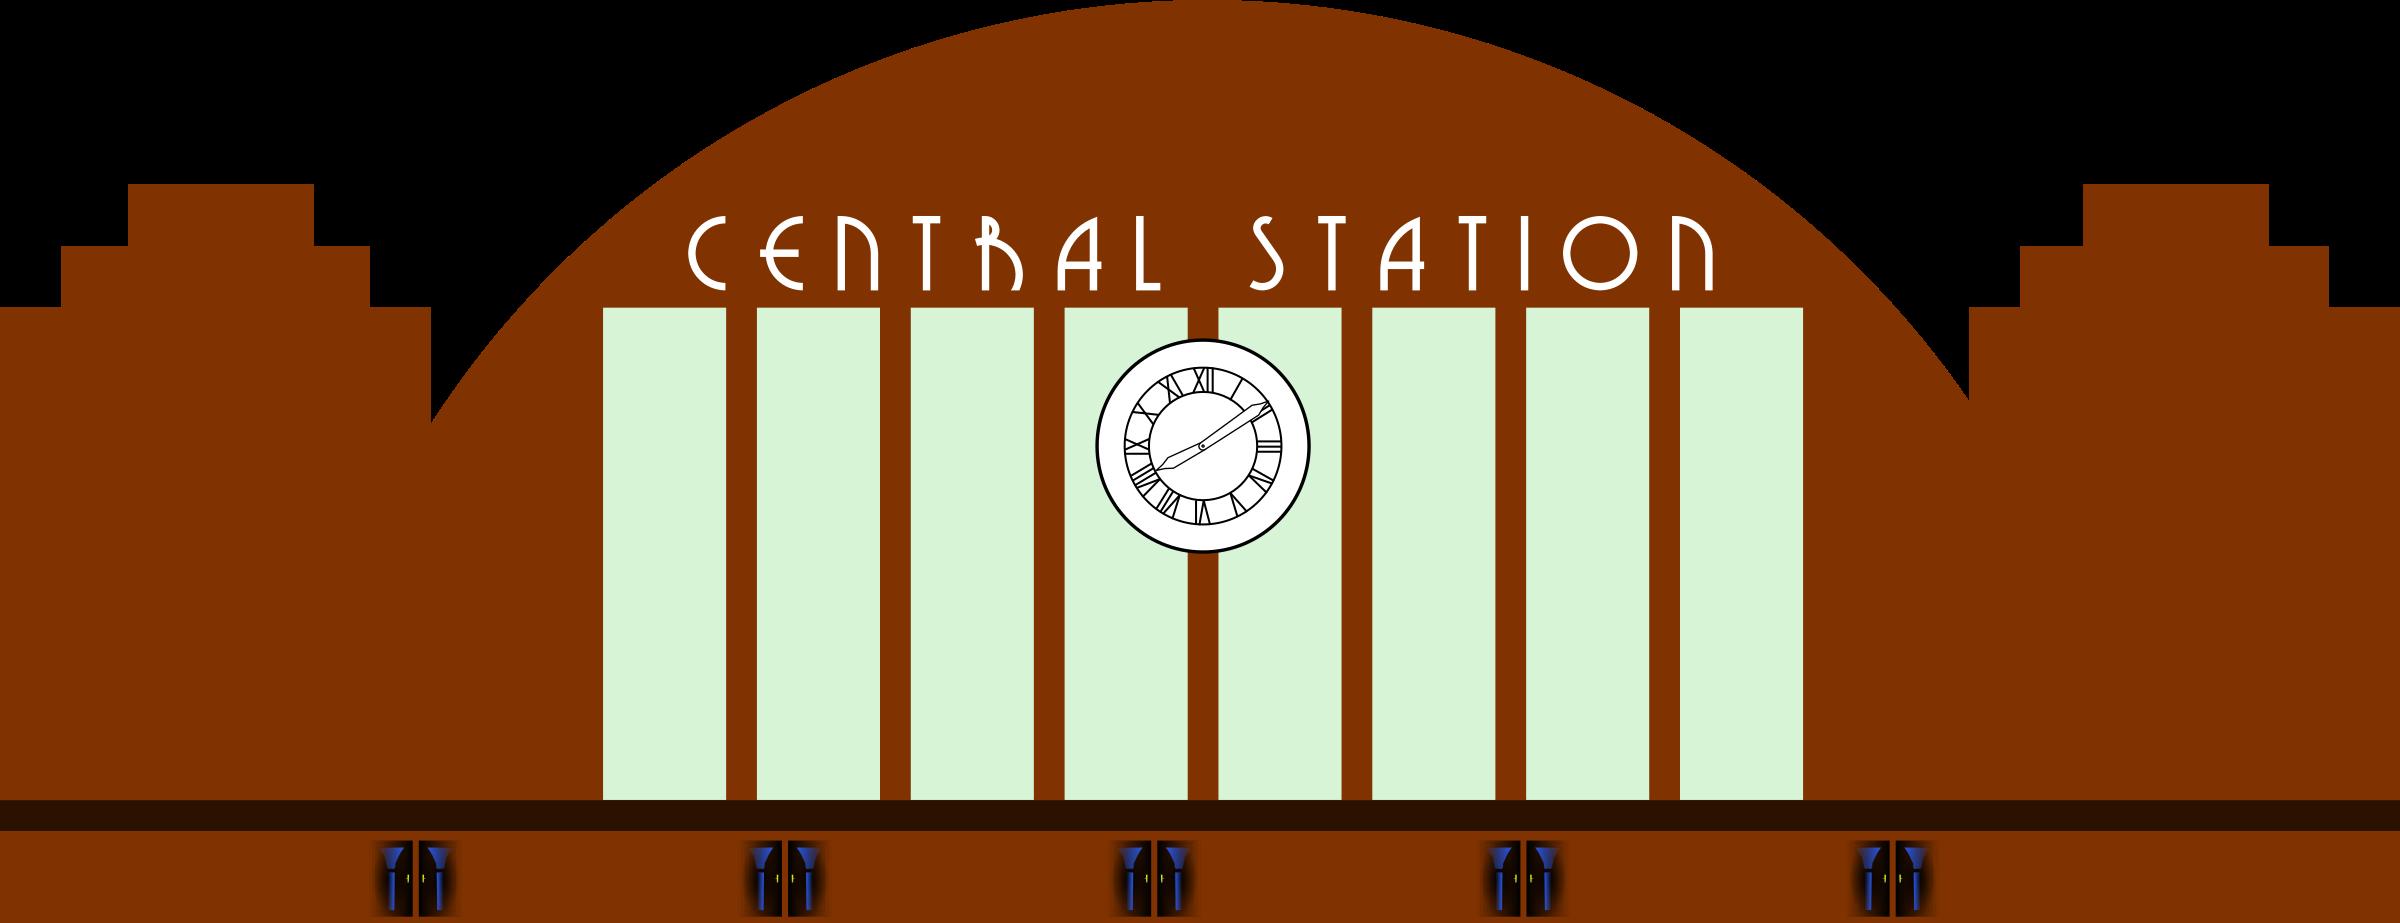 Train Station Clip Art-Train Station Clip Art-15